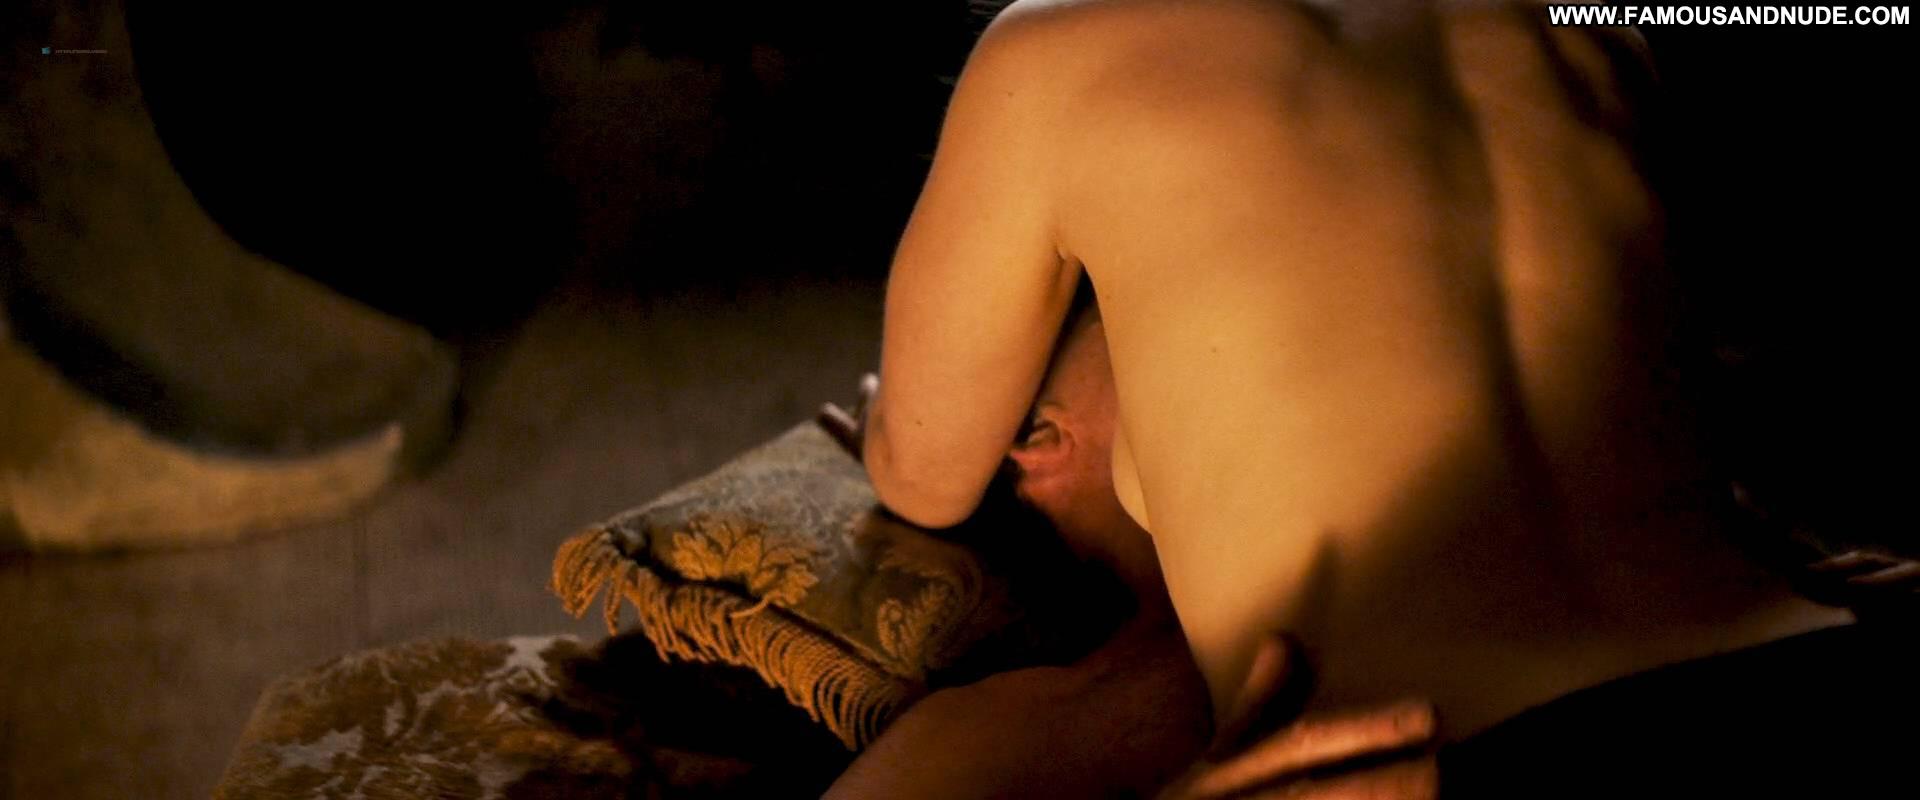 Emilia Clarke Sex Stories